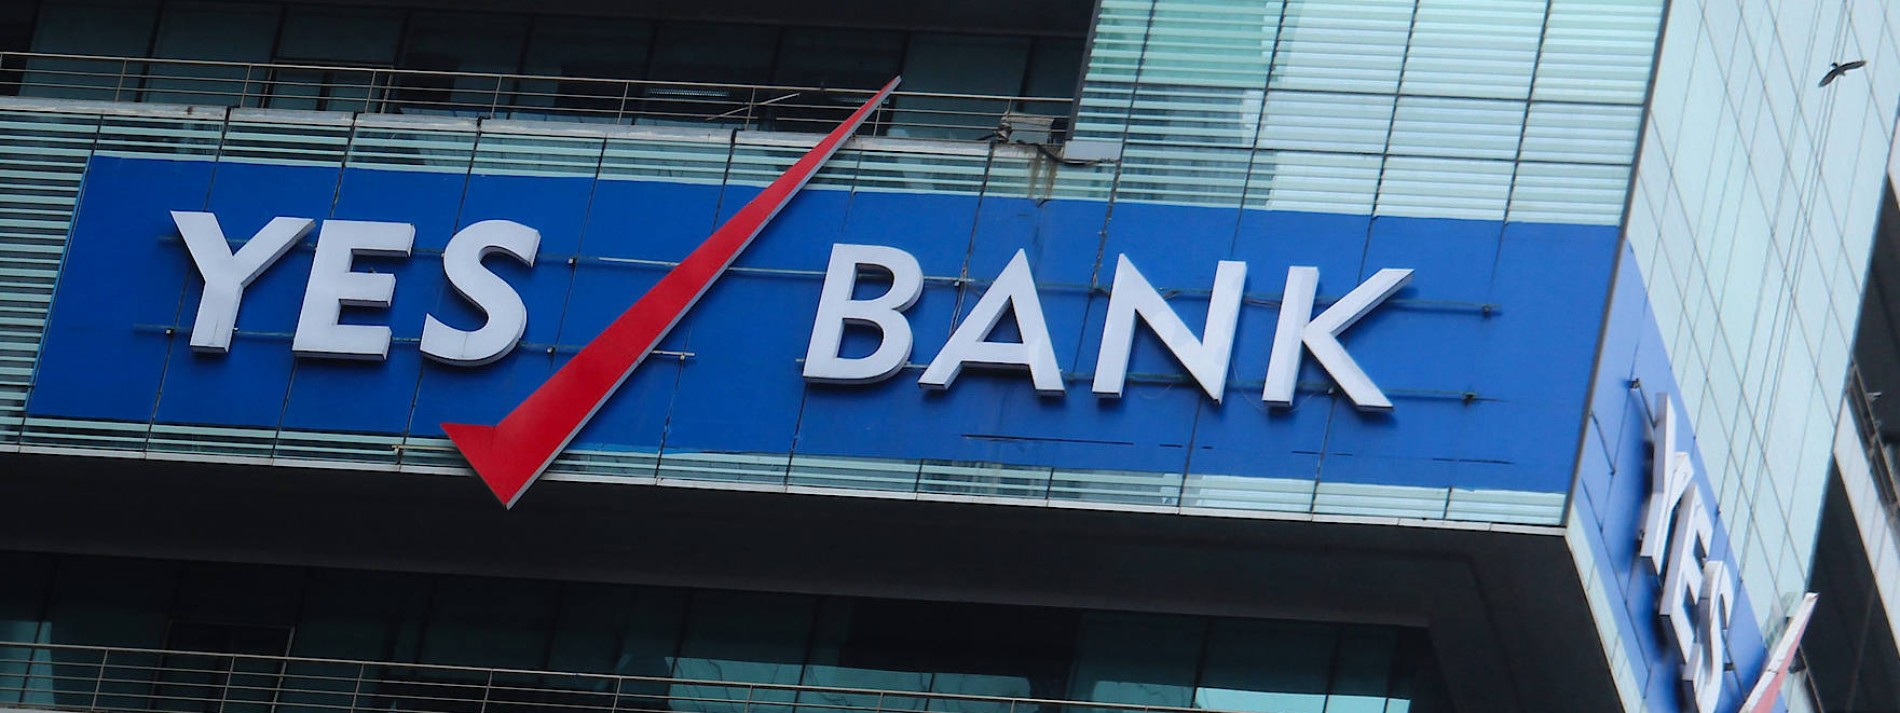 Bankenkrise in Indien erfasst weiteres Kreditinstitut